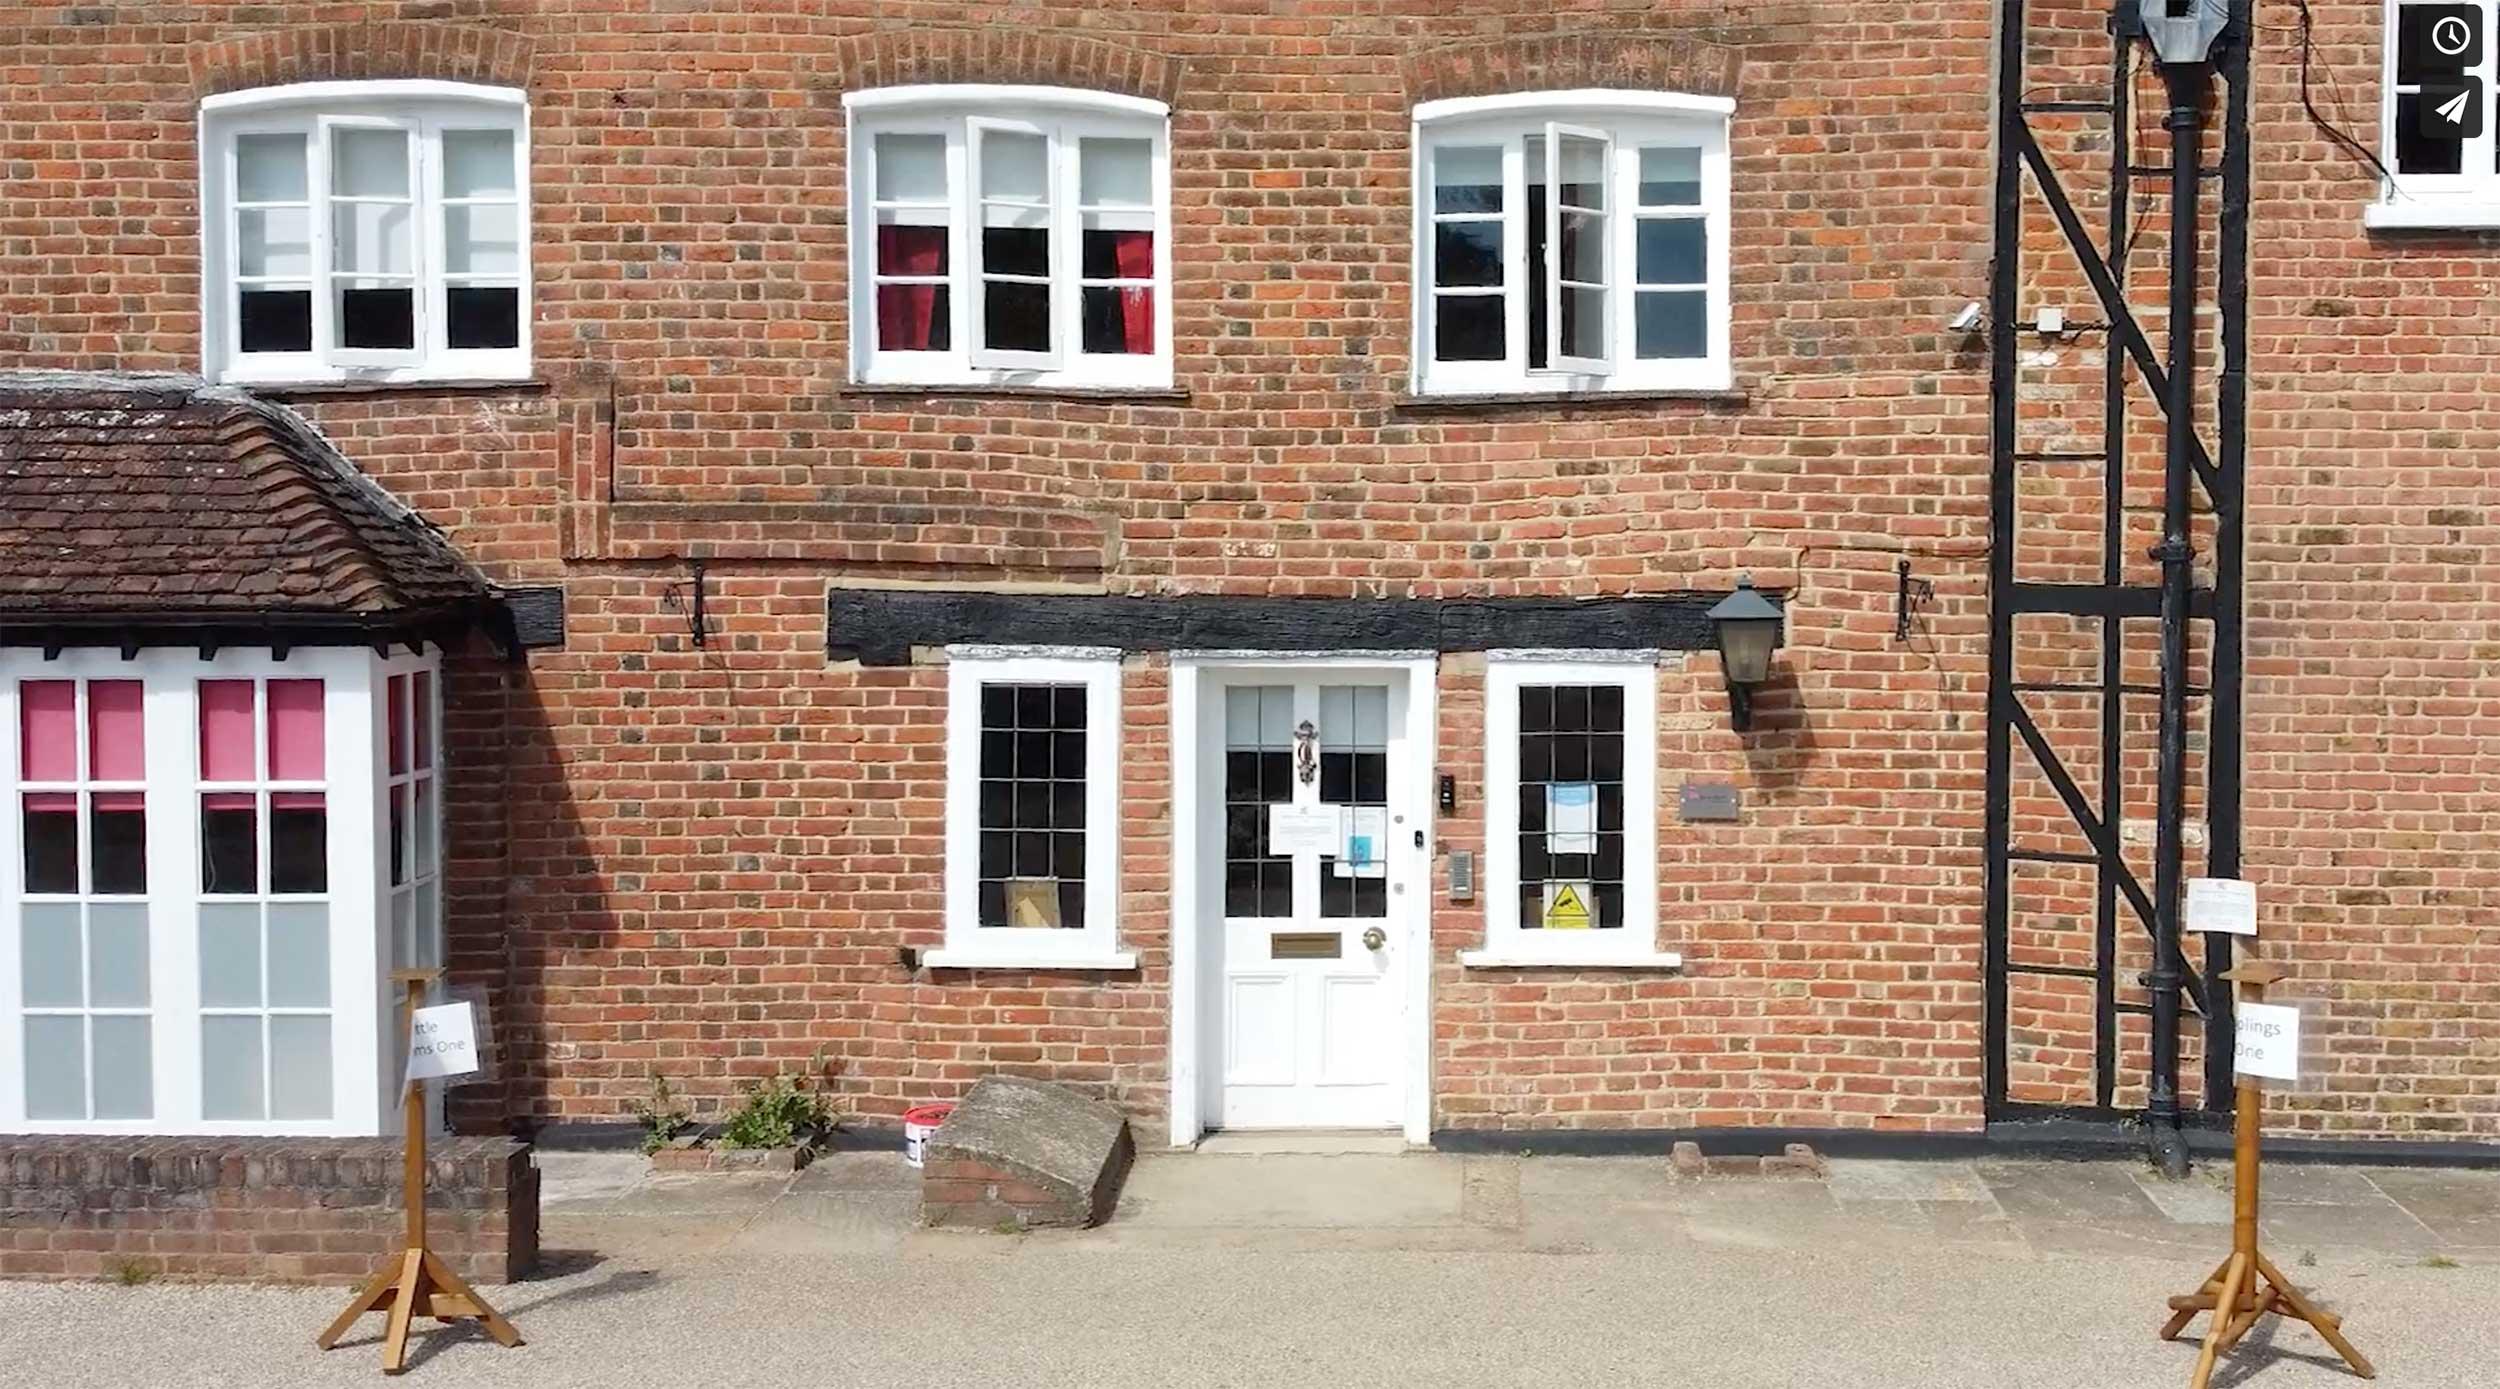 Entrance to Ruxley Manor